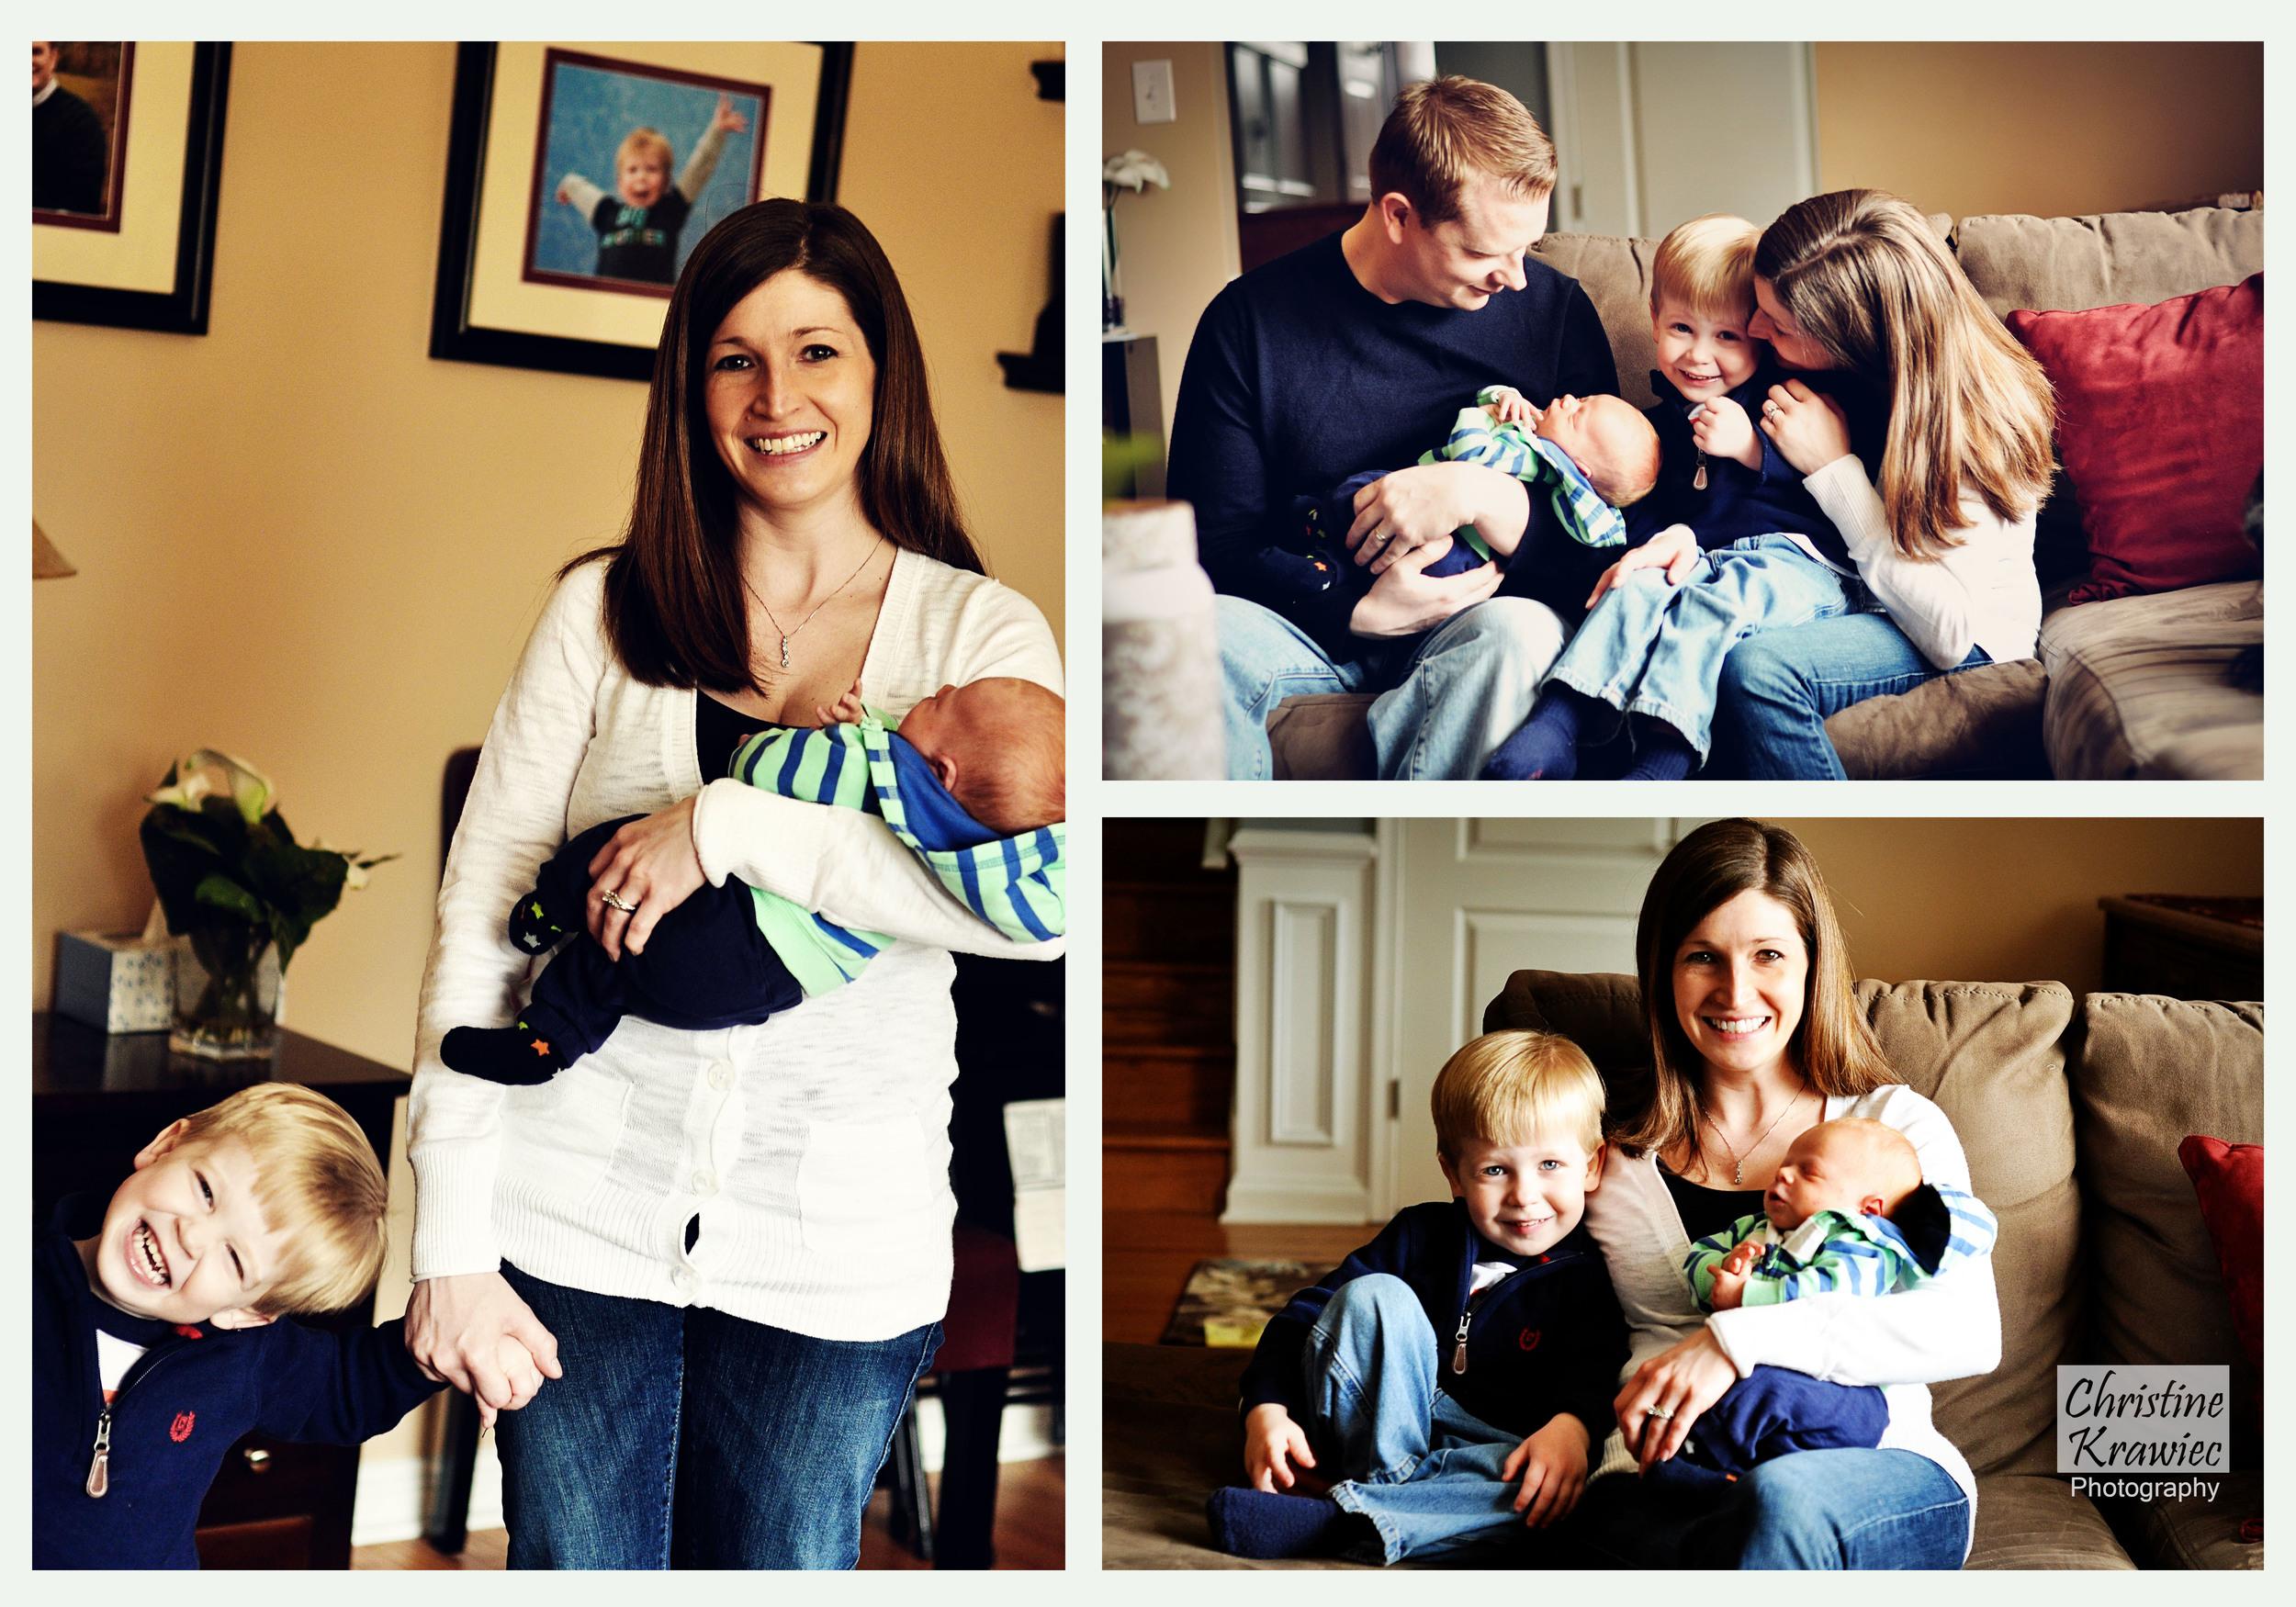 Christine KRawiec PHotography - Broomall Newborn Photographer